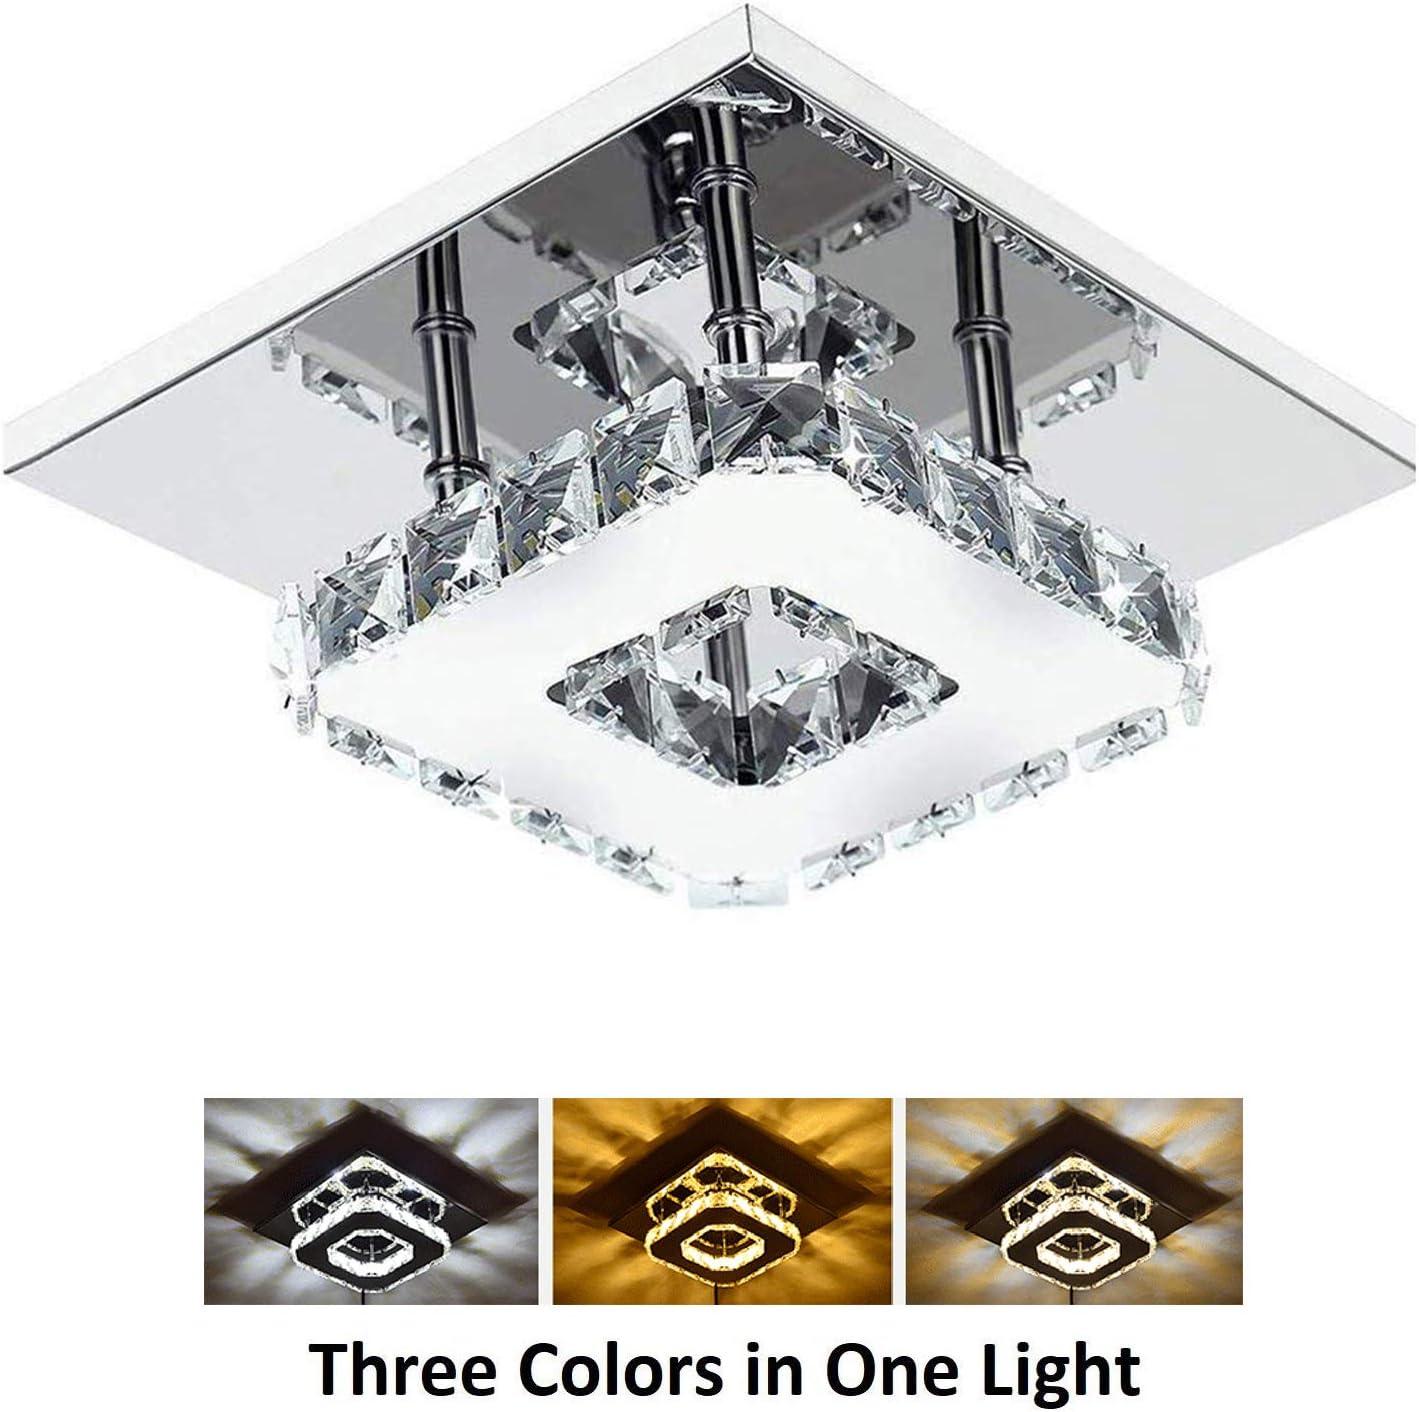 Ganeed Crystal Ceiling Light,11W LED Flush Mount Ceiling Light, Modern  Square Mini Chandelier for Dining Room Living Room Bedroom Hallway(11.11